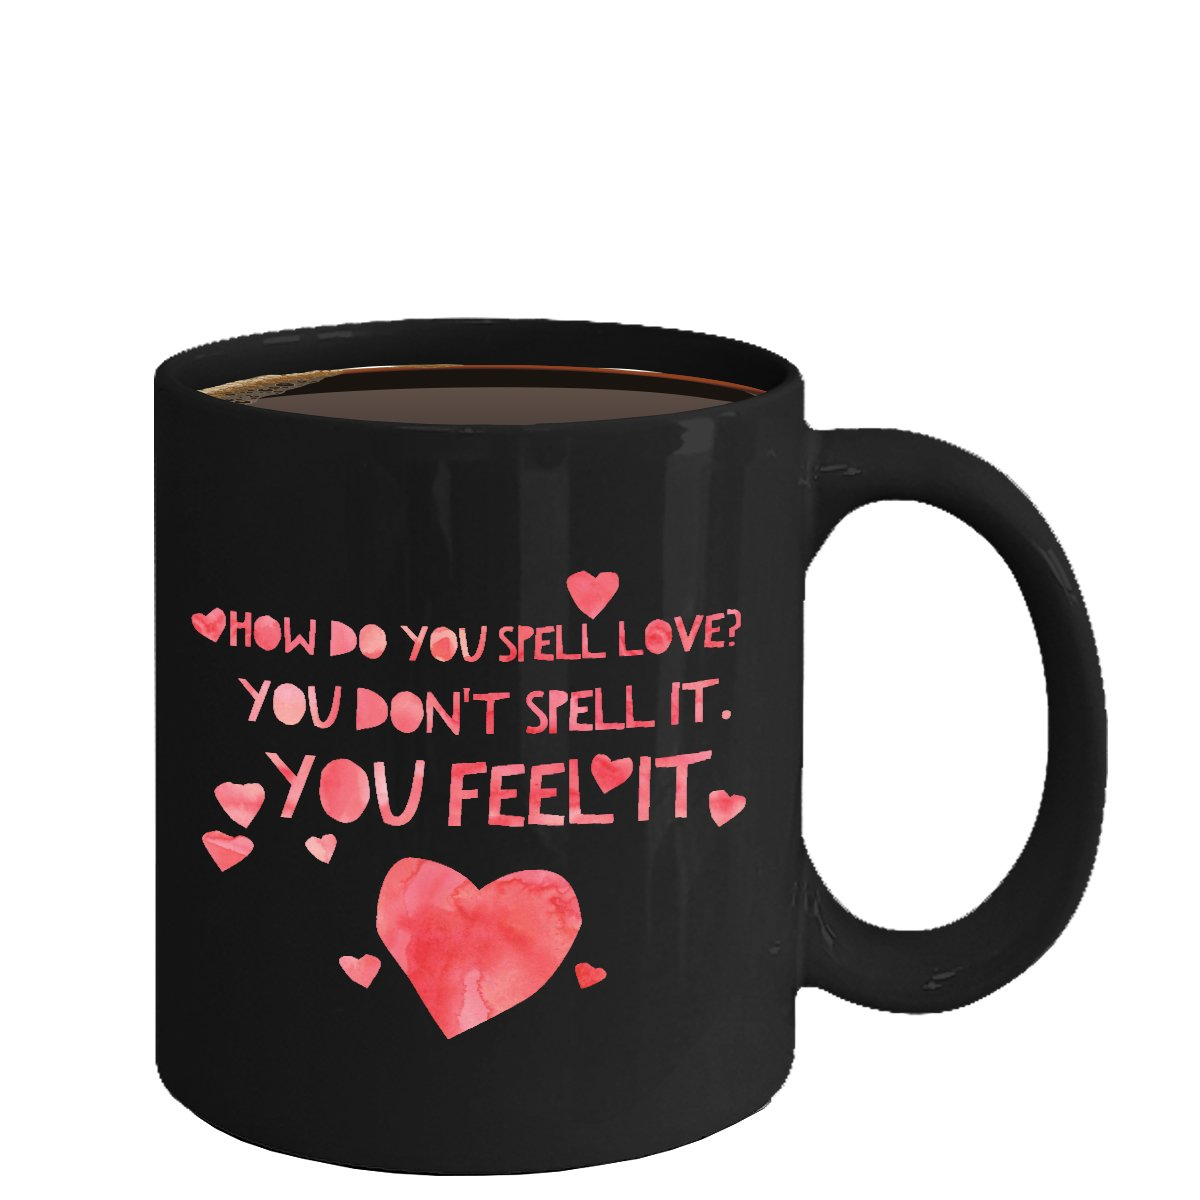 Love Ceramic Coffee Mug - Spell Love - Cute Large Cup (Black) - Best Gift for Men, Women